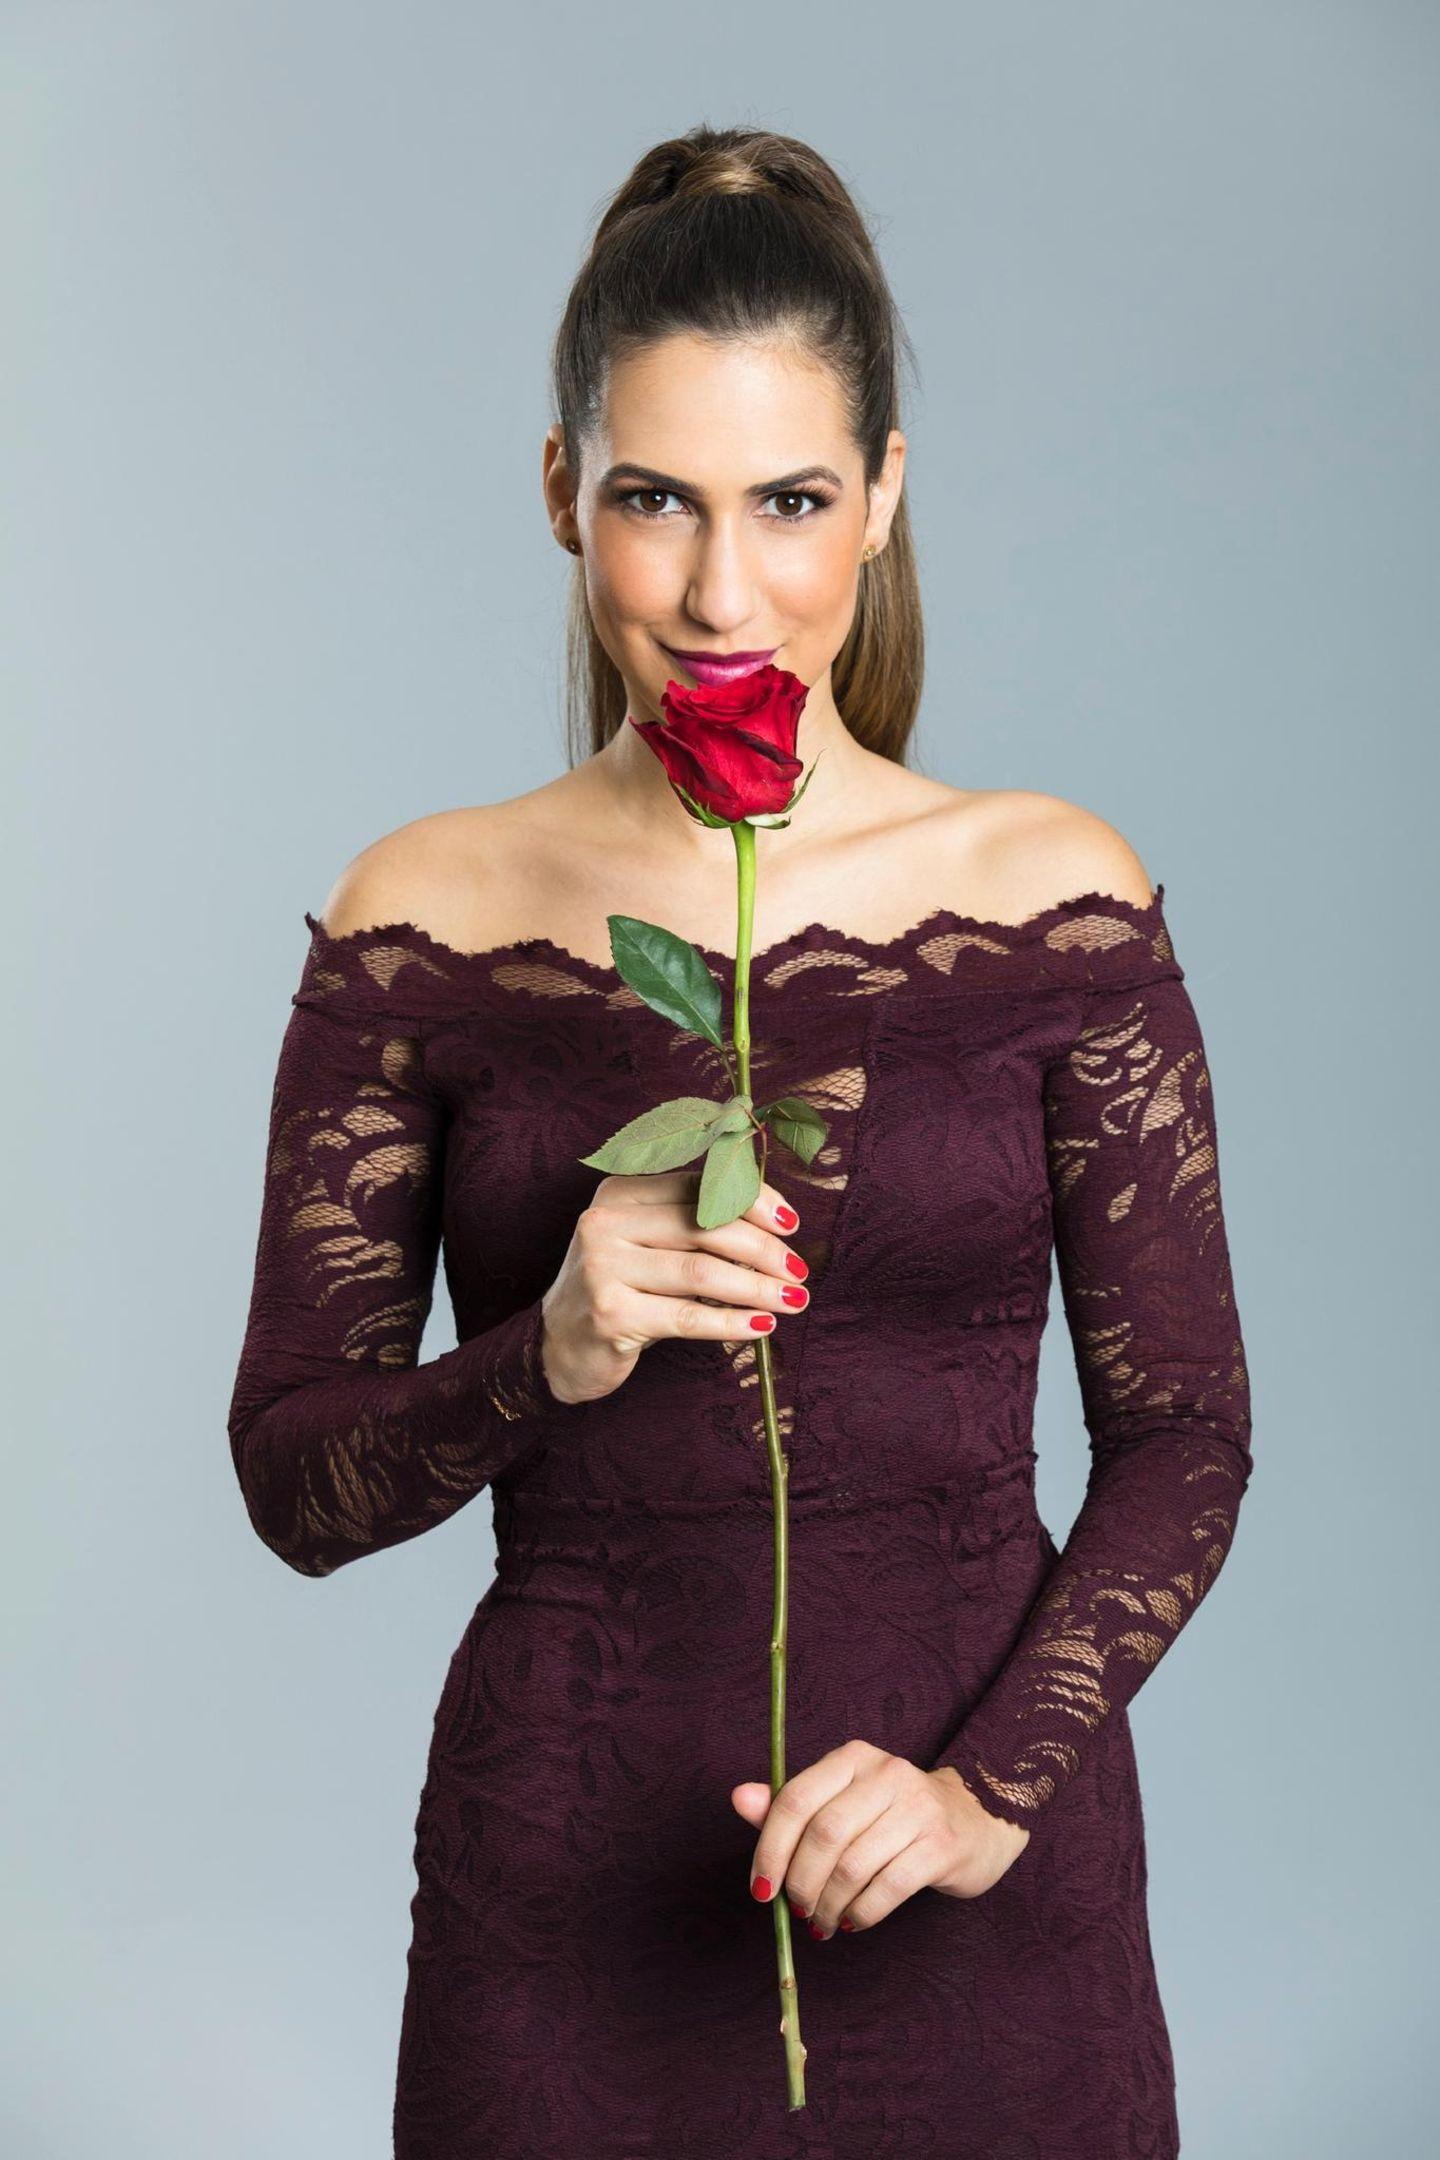 Bachelor-Kandidatin Clea-Lacy Juhn